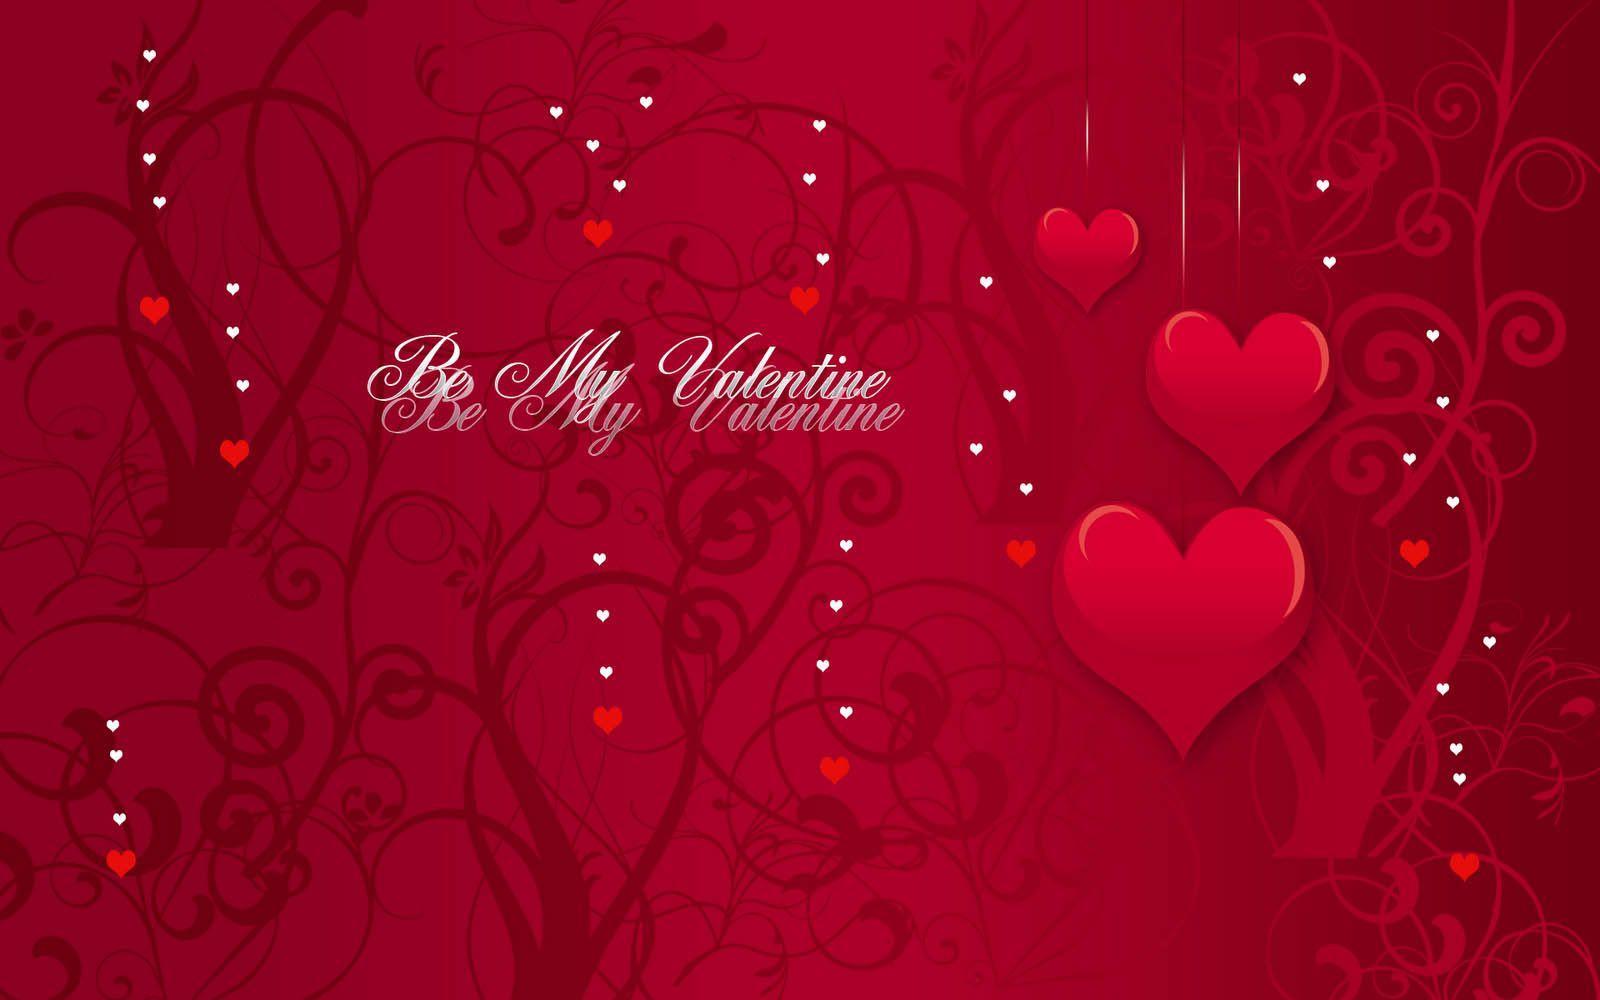 free valentines day desktop backgrounds